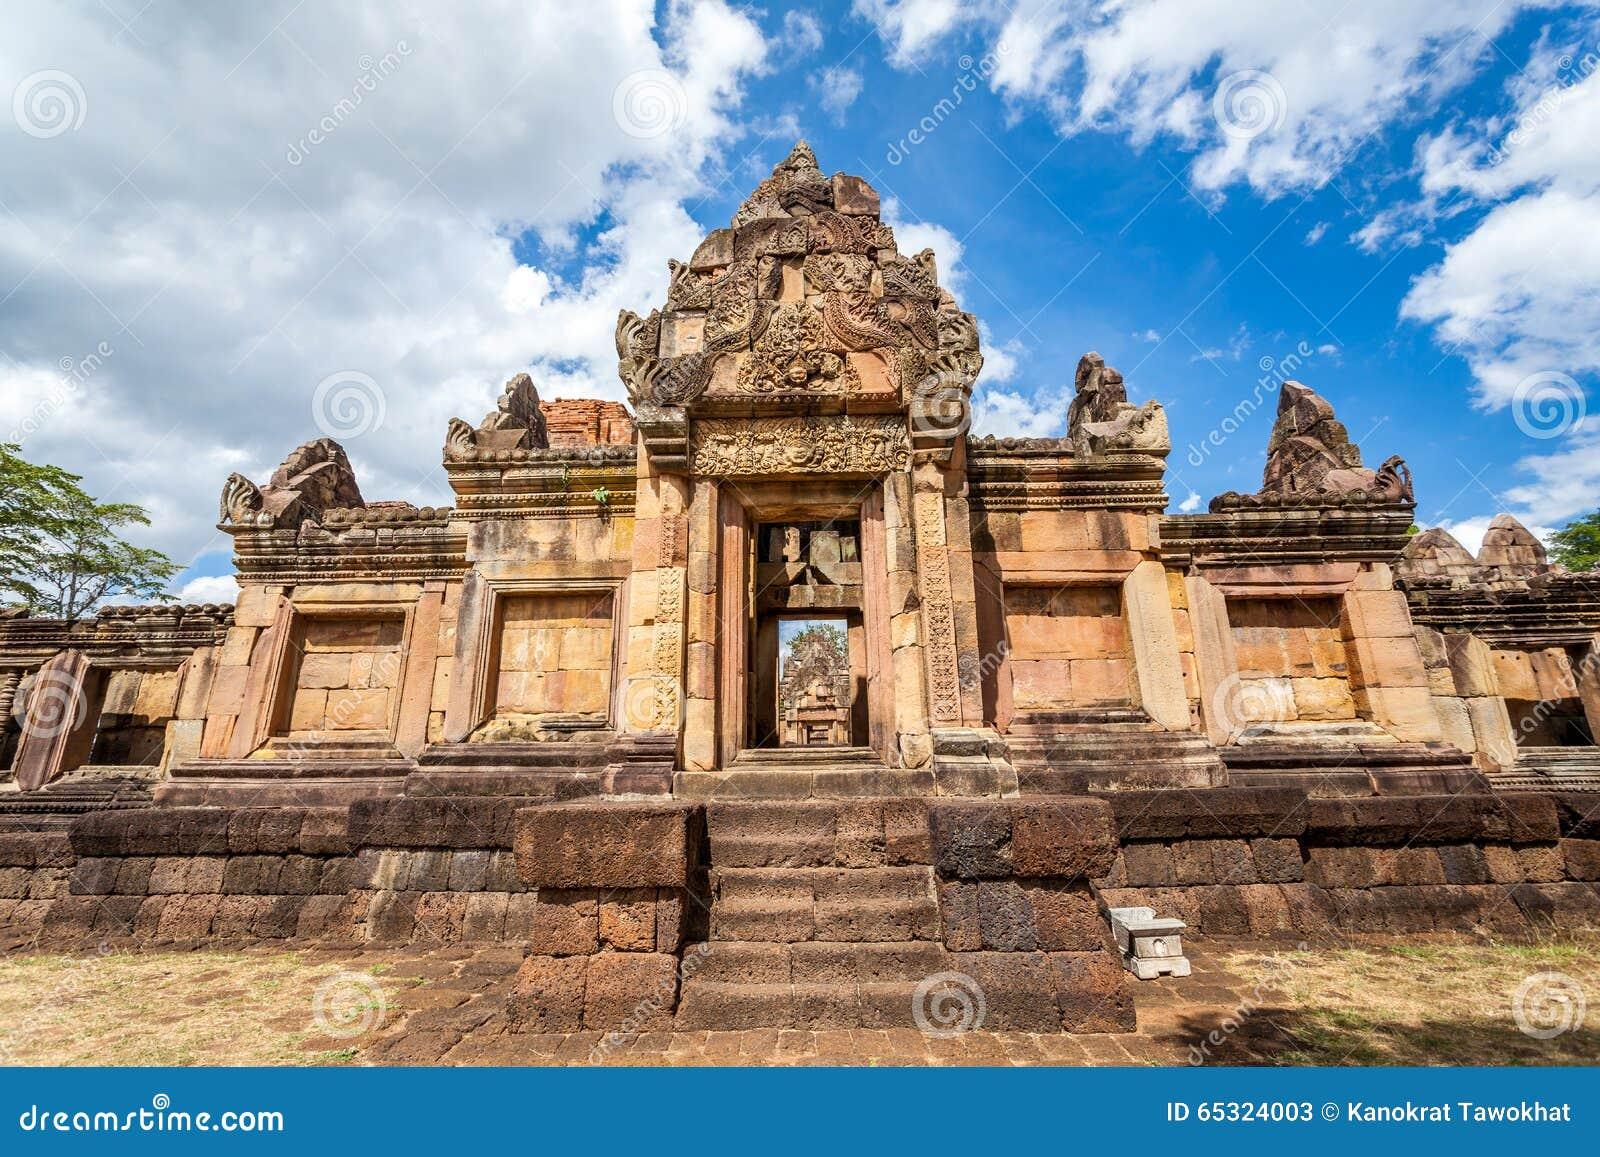 Rovina religiosa di Prasat Hin Mueang Tam Hindu situata in Buri Ram Province Thailand